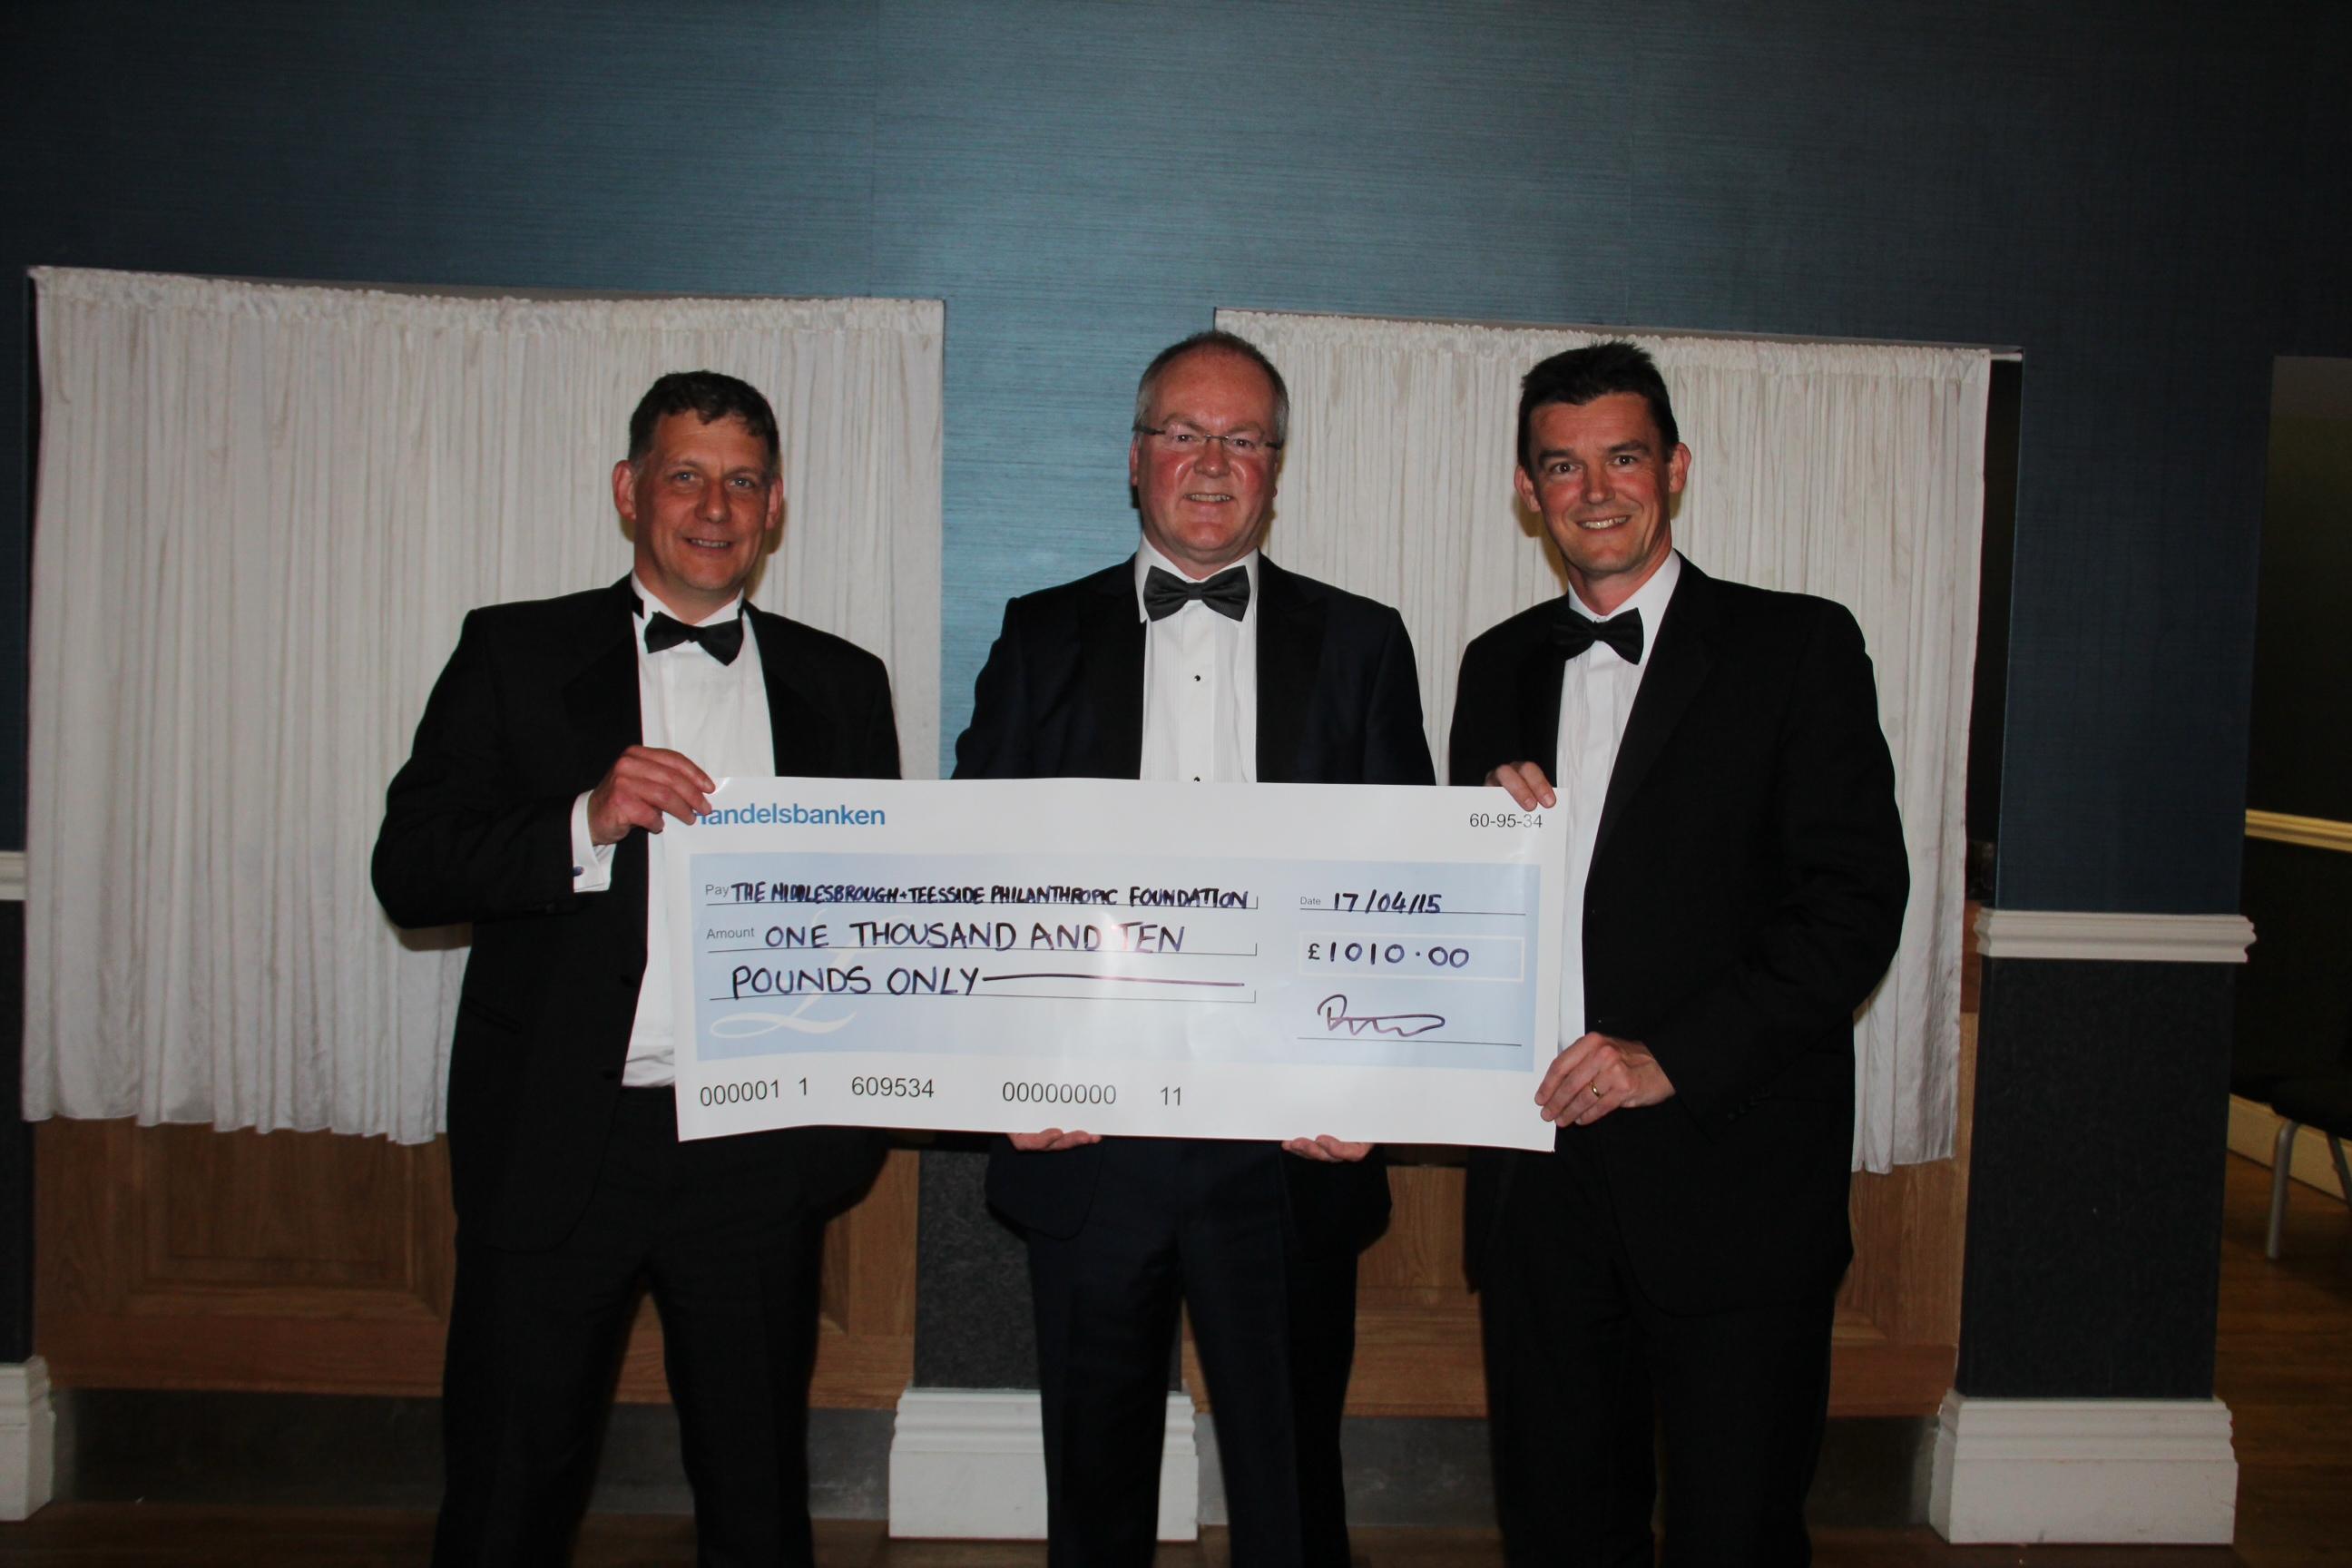 The Middlesborough-Teesside Philanthropic Foundation